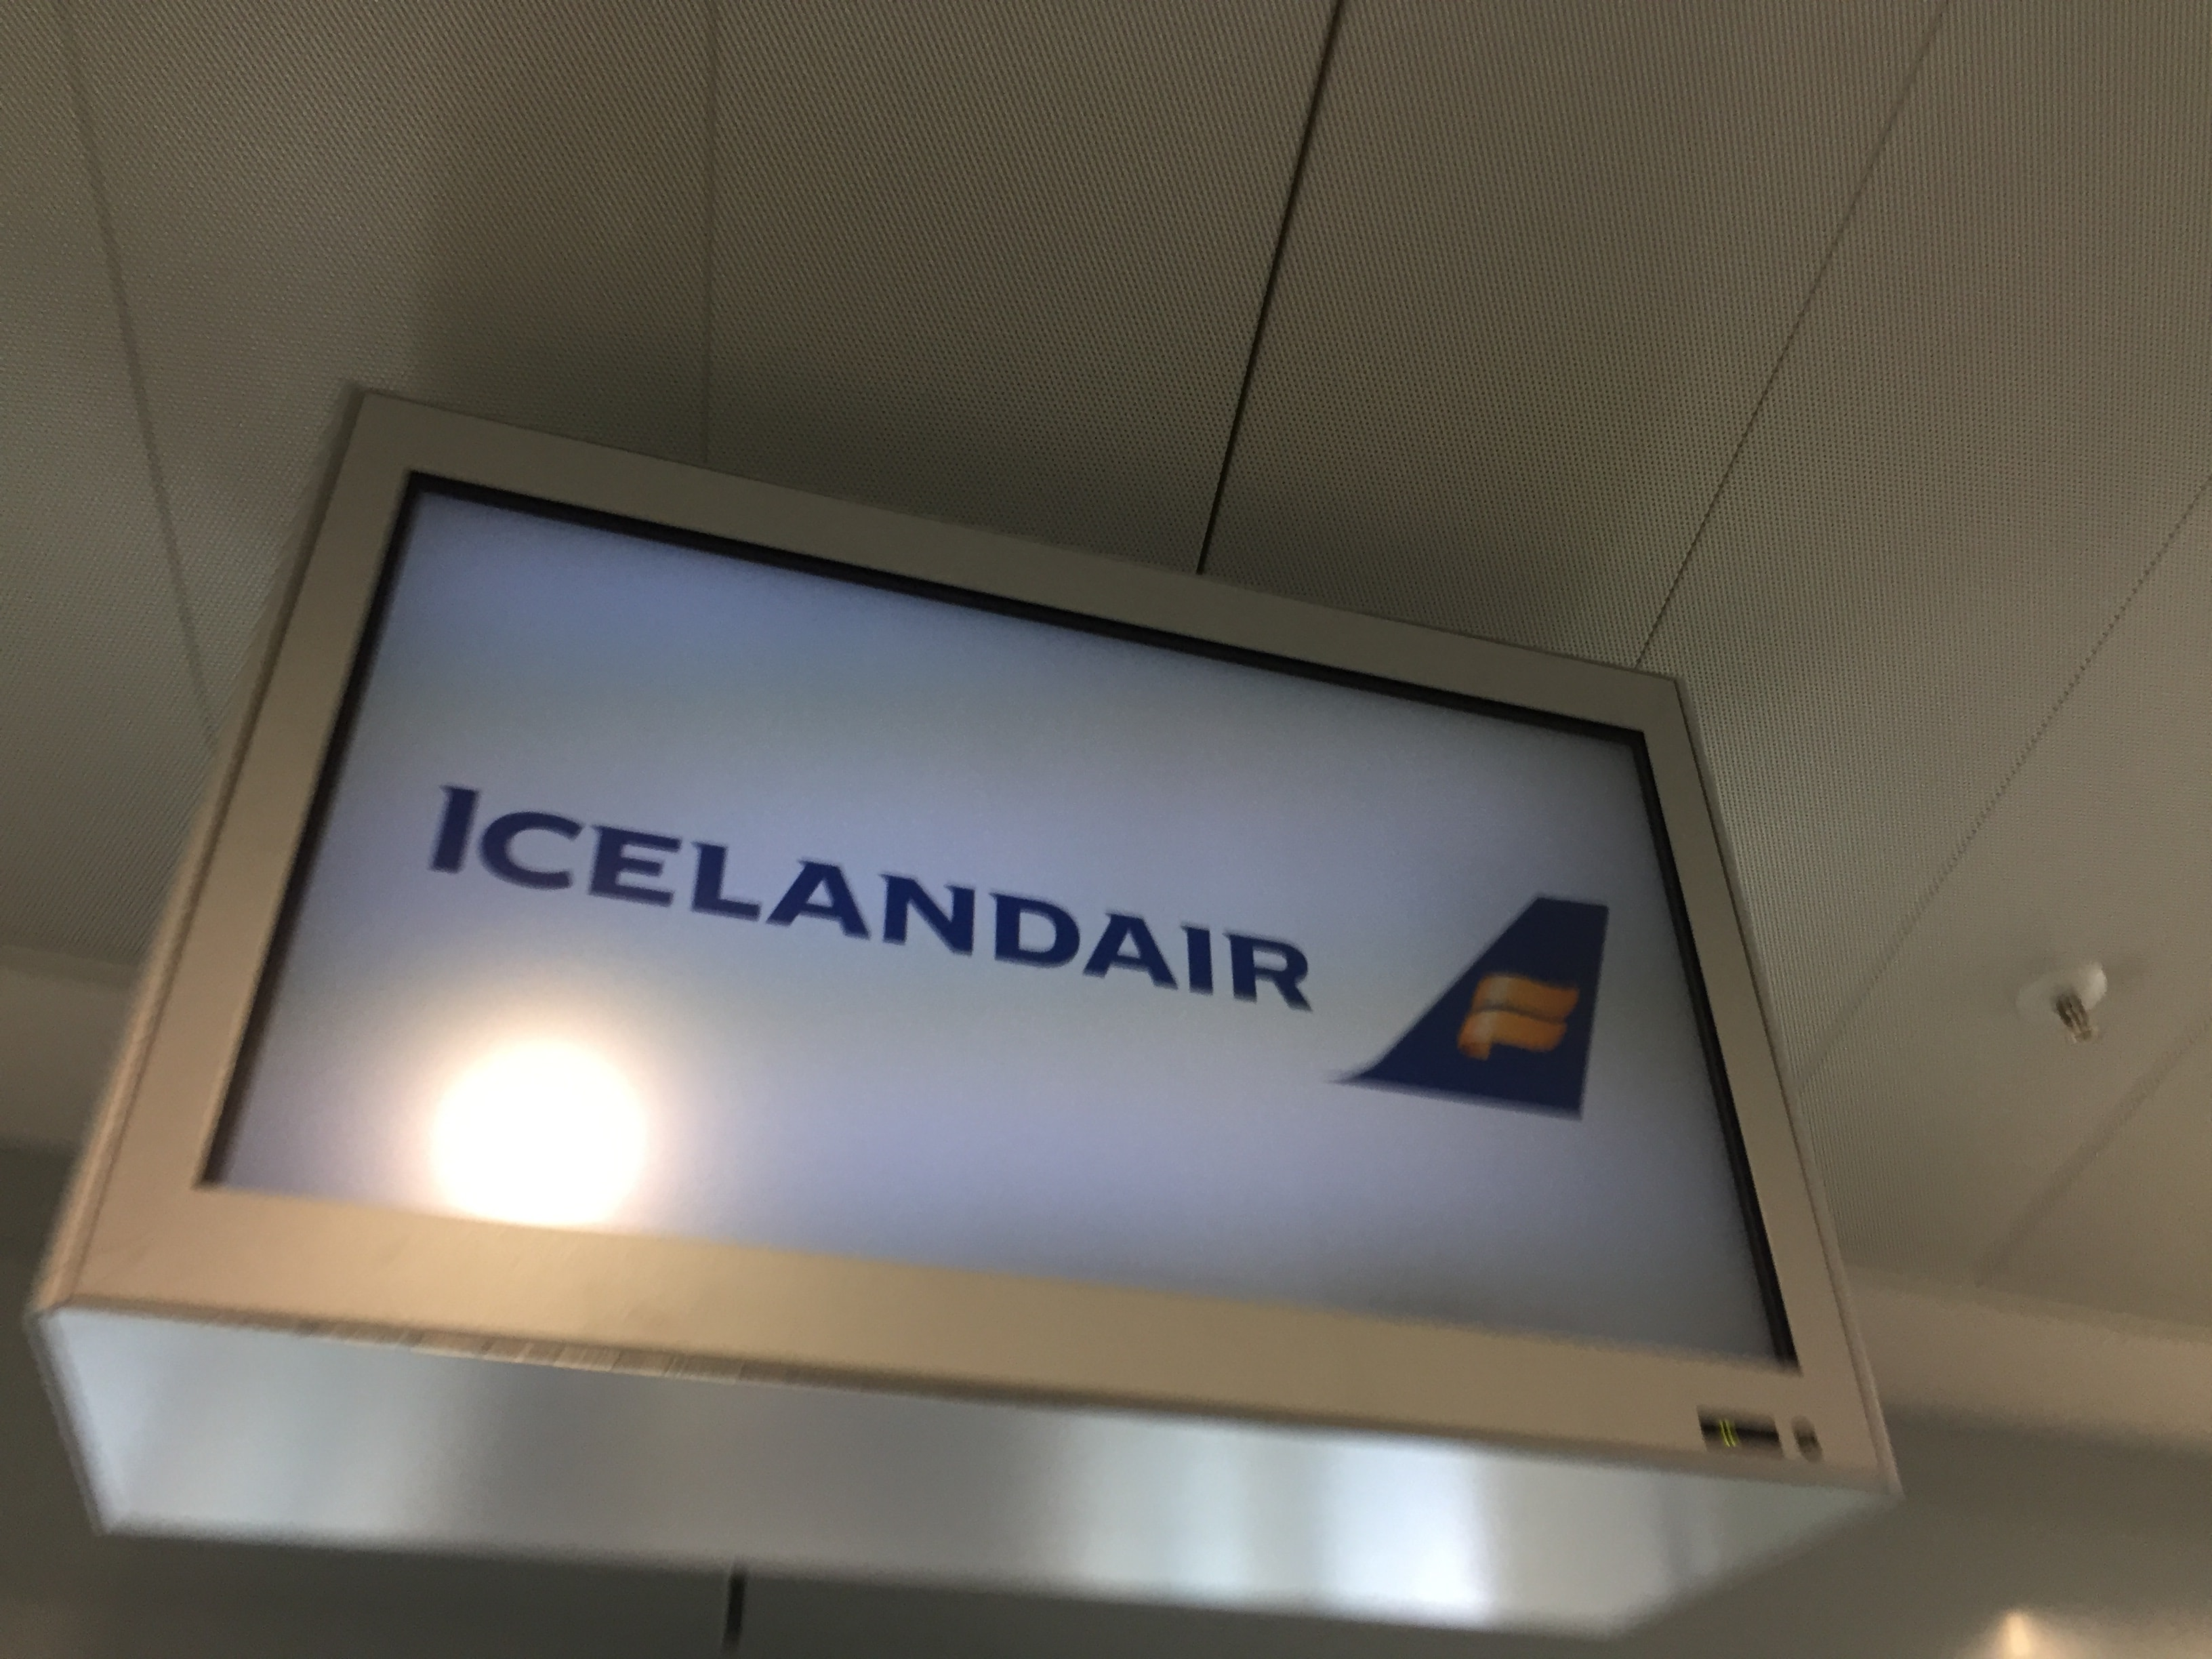 Saga Class von Icelandair nach Island